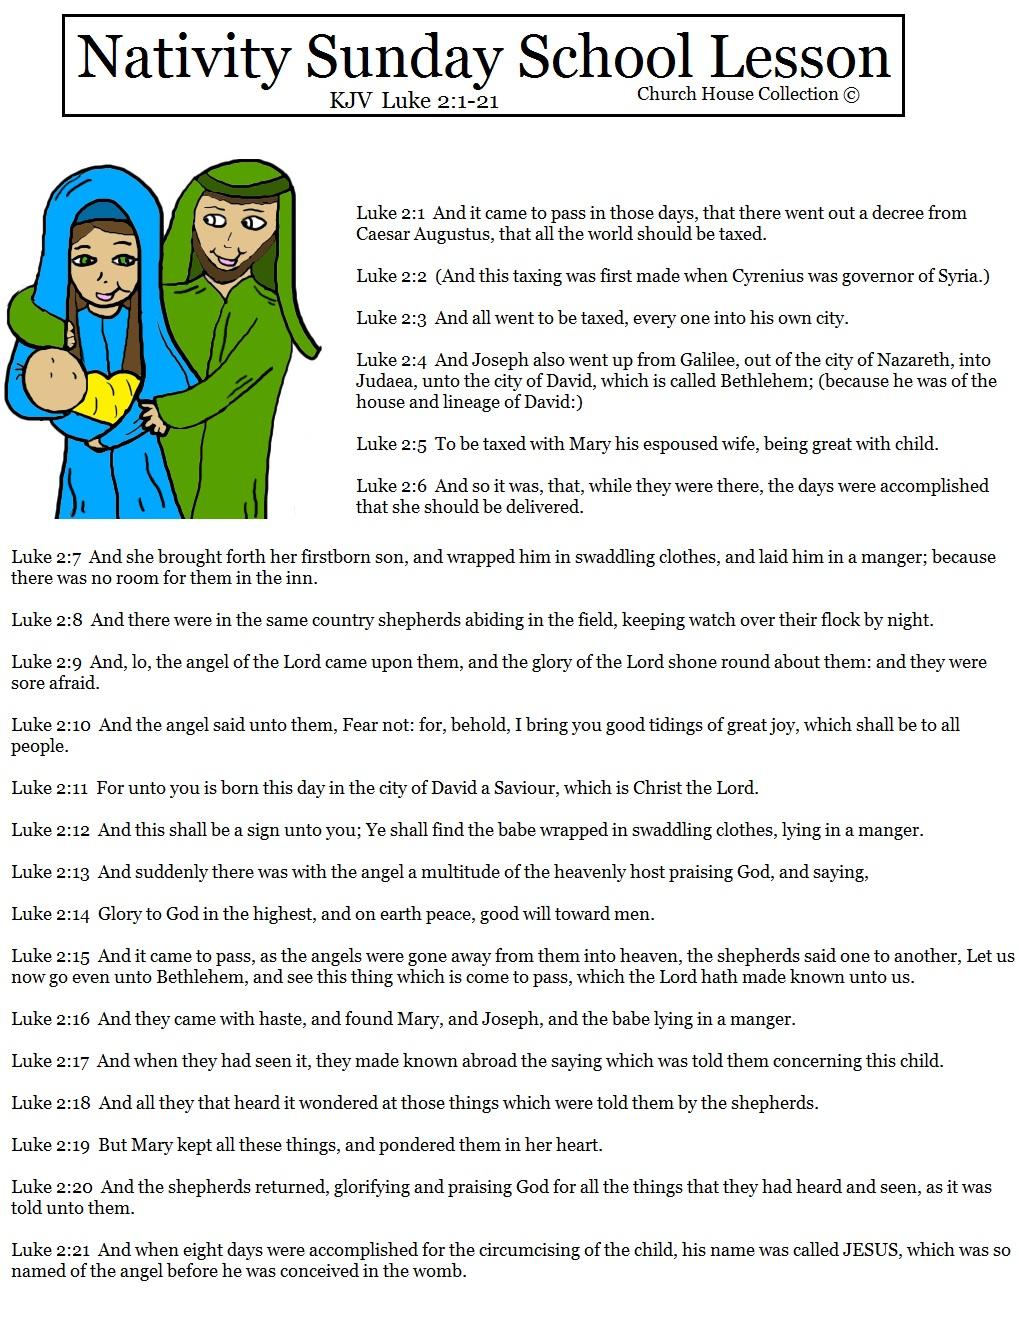 Church House Collection Blog: Nativity Sunday School Lesson